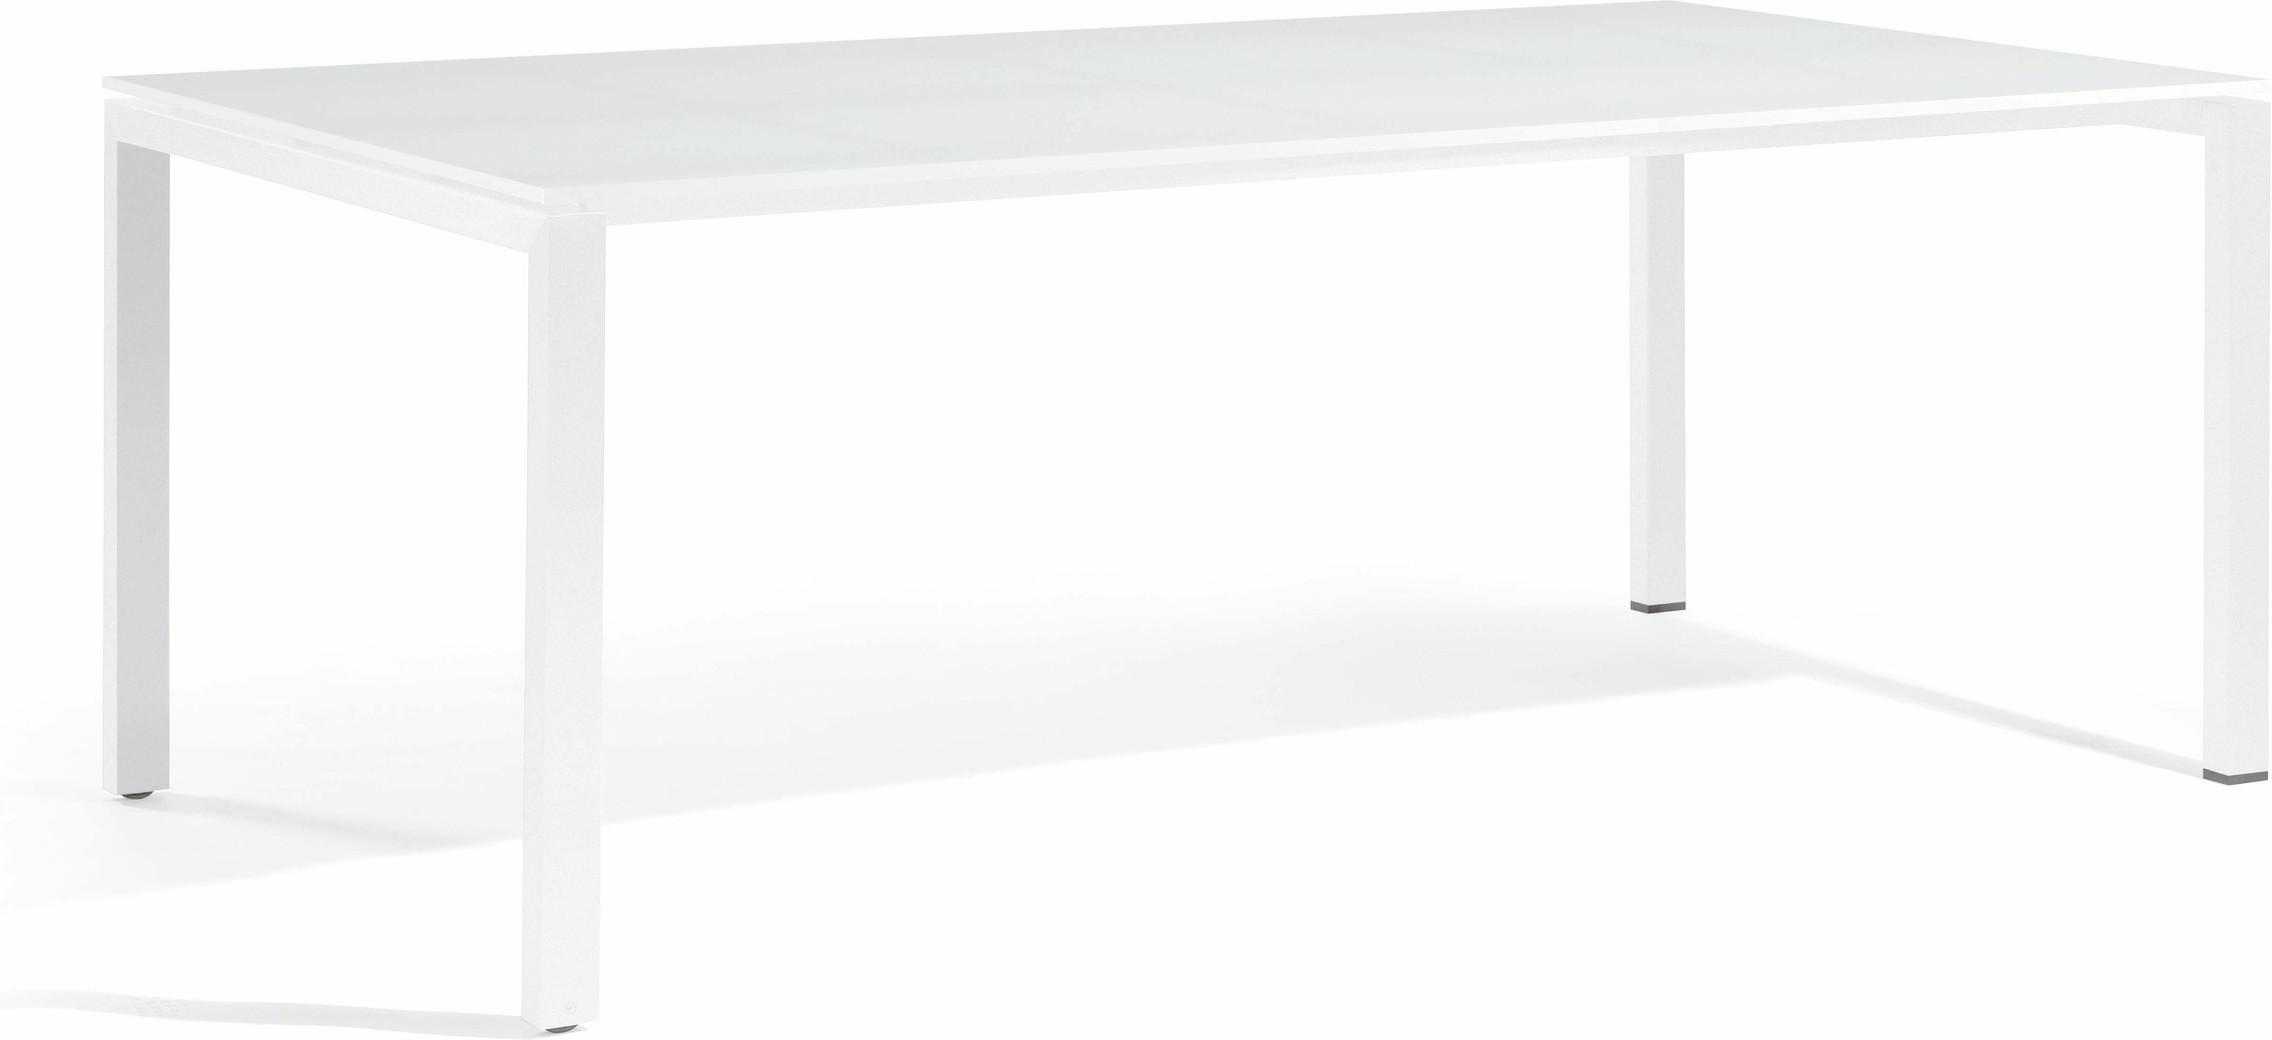 Trento Dining table - ceramic white 6mm EW 270